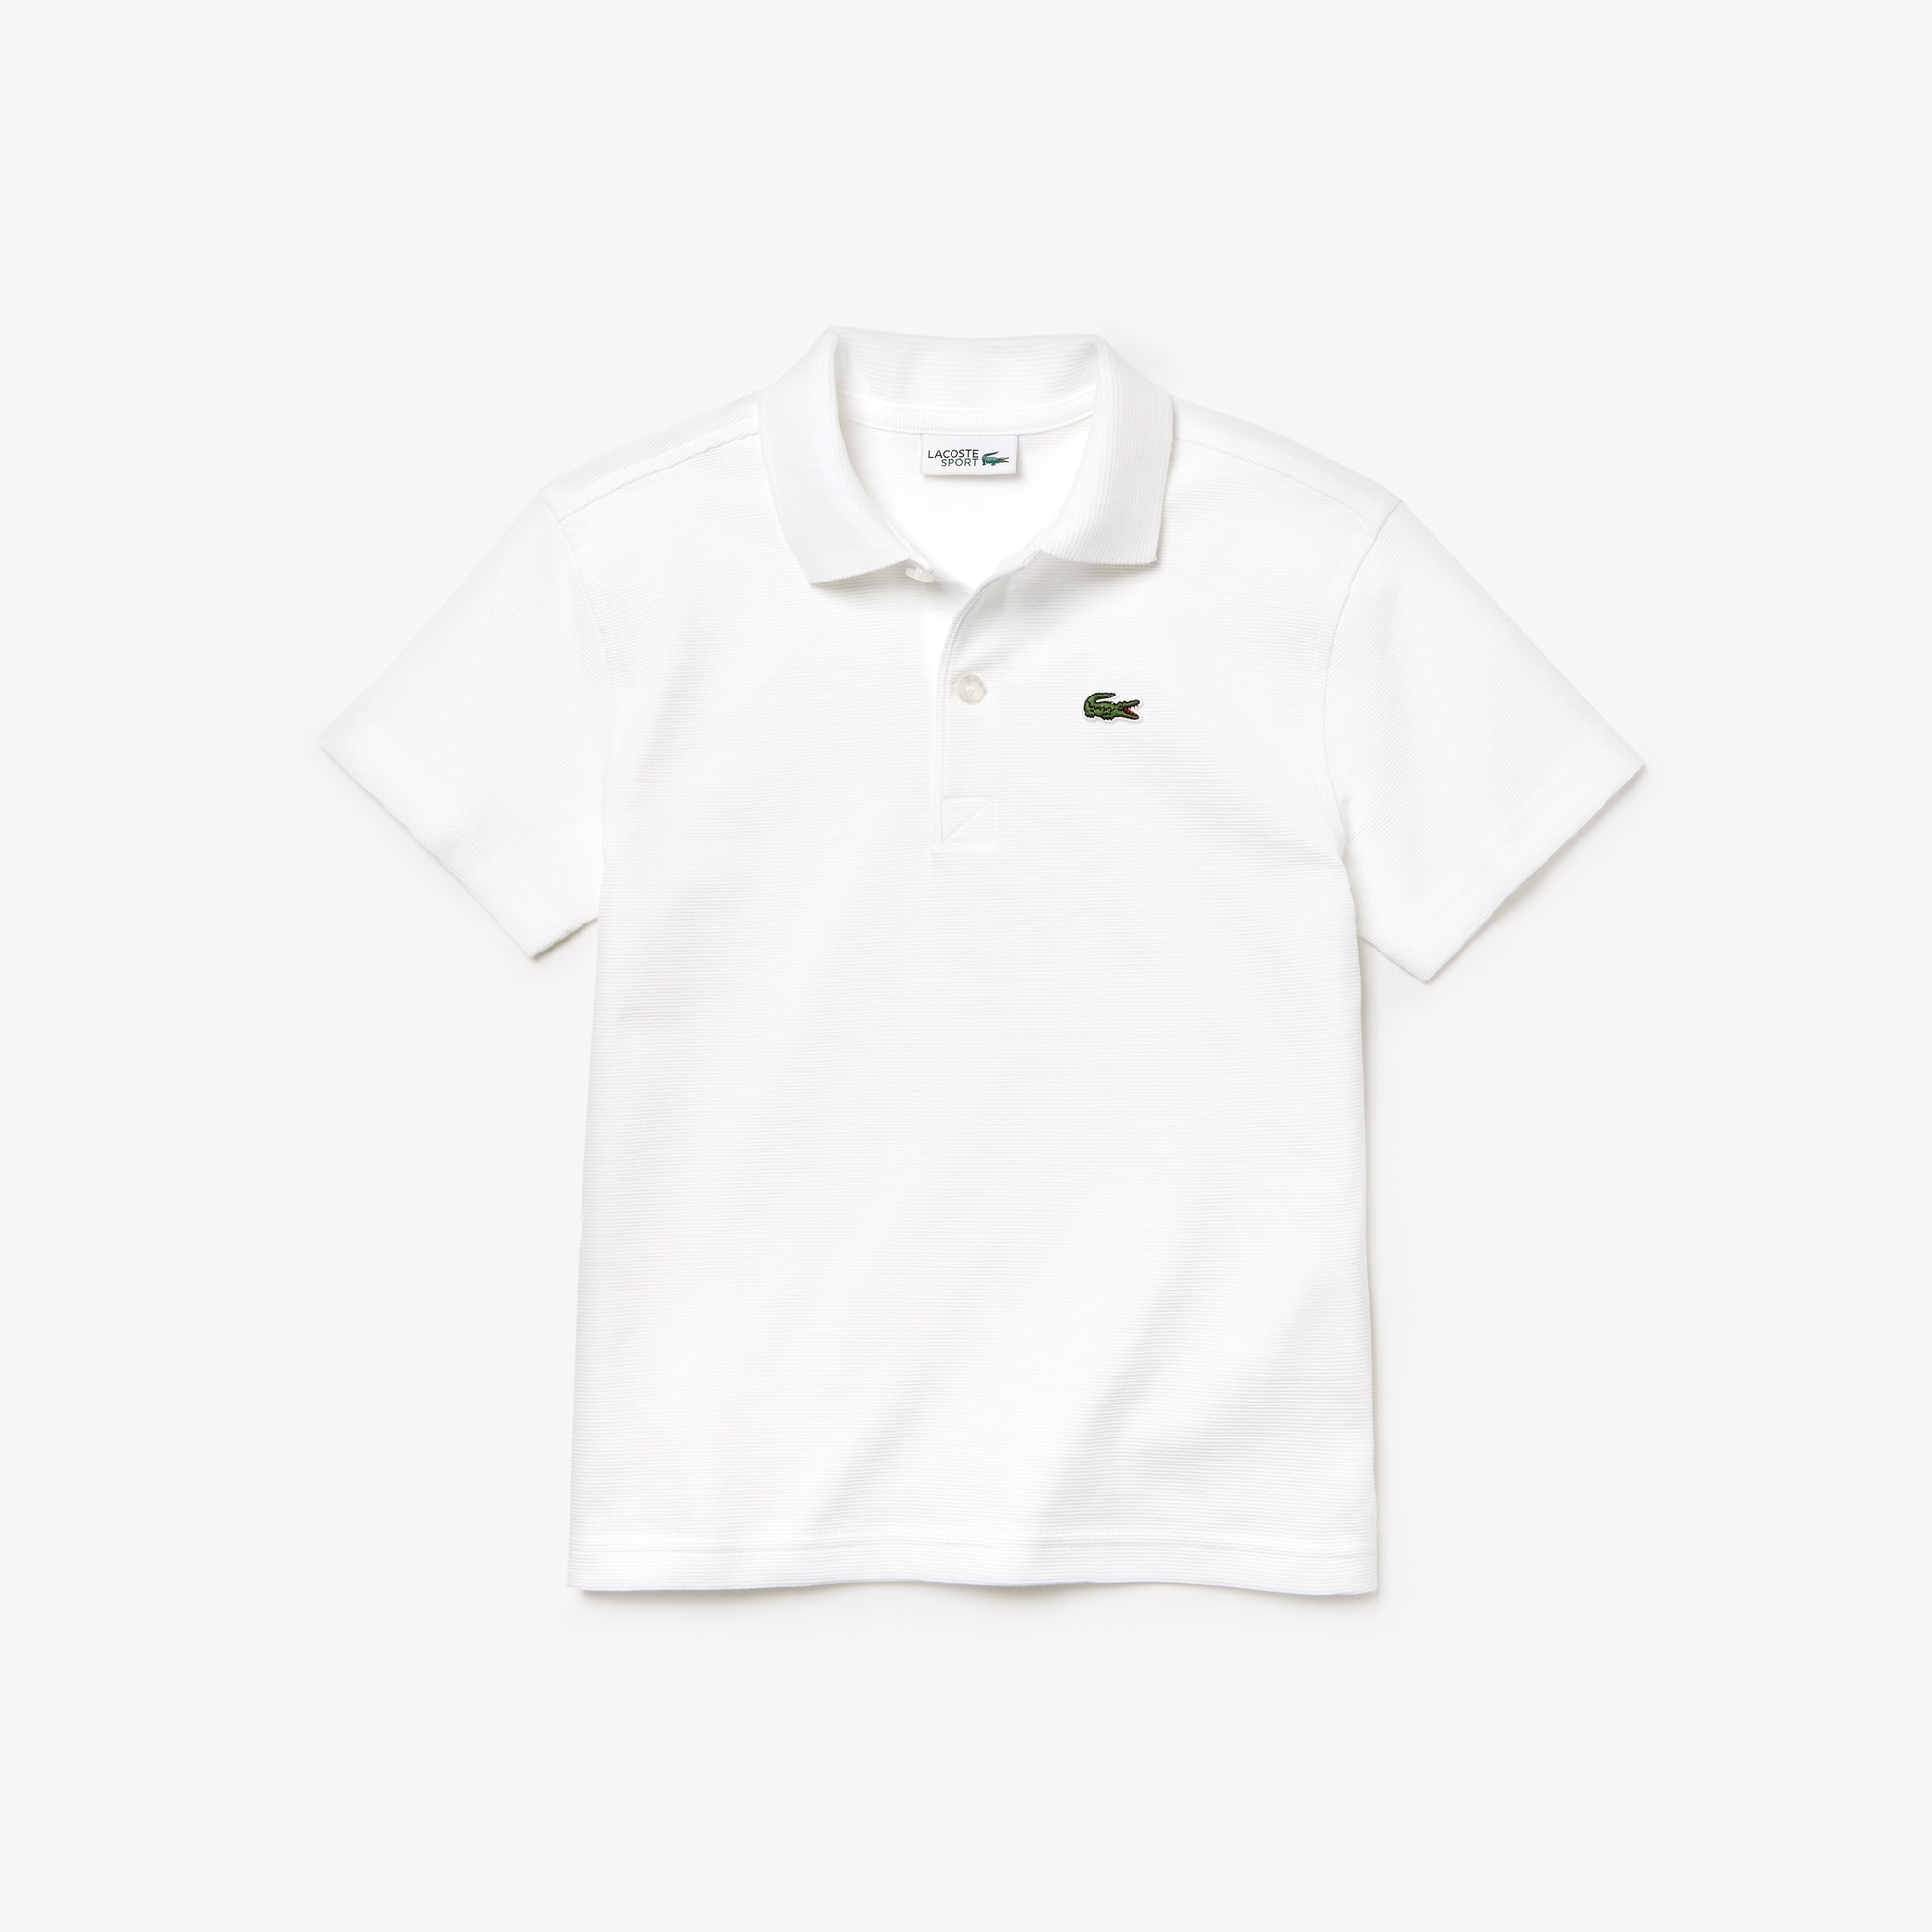 dbe78e6e3ce Polo shirts, shoes, leather goods | LACOSTE Online Boutique